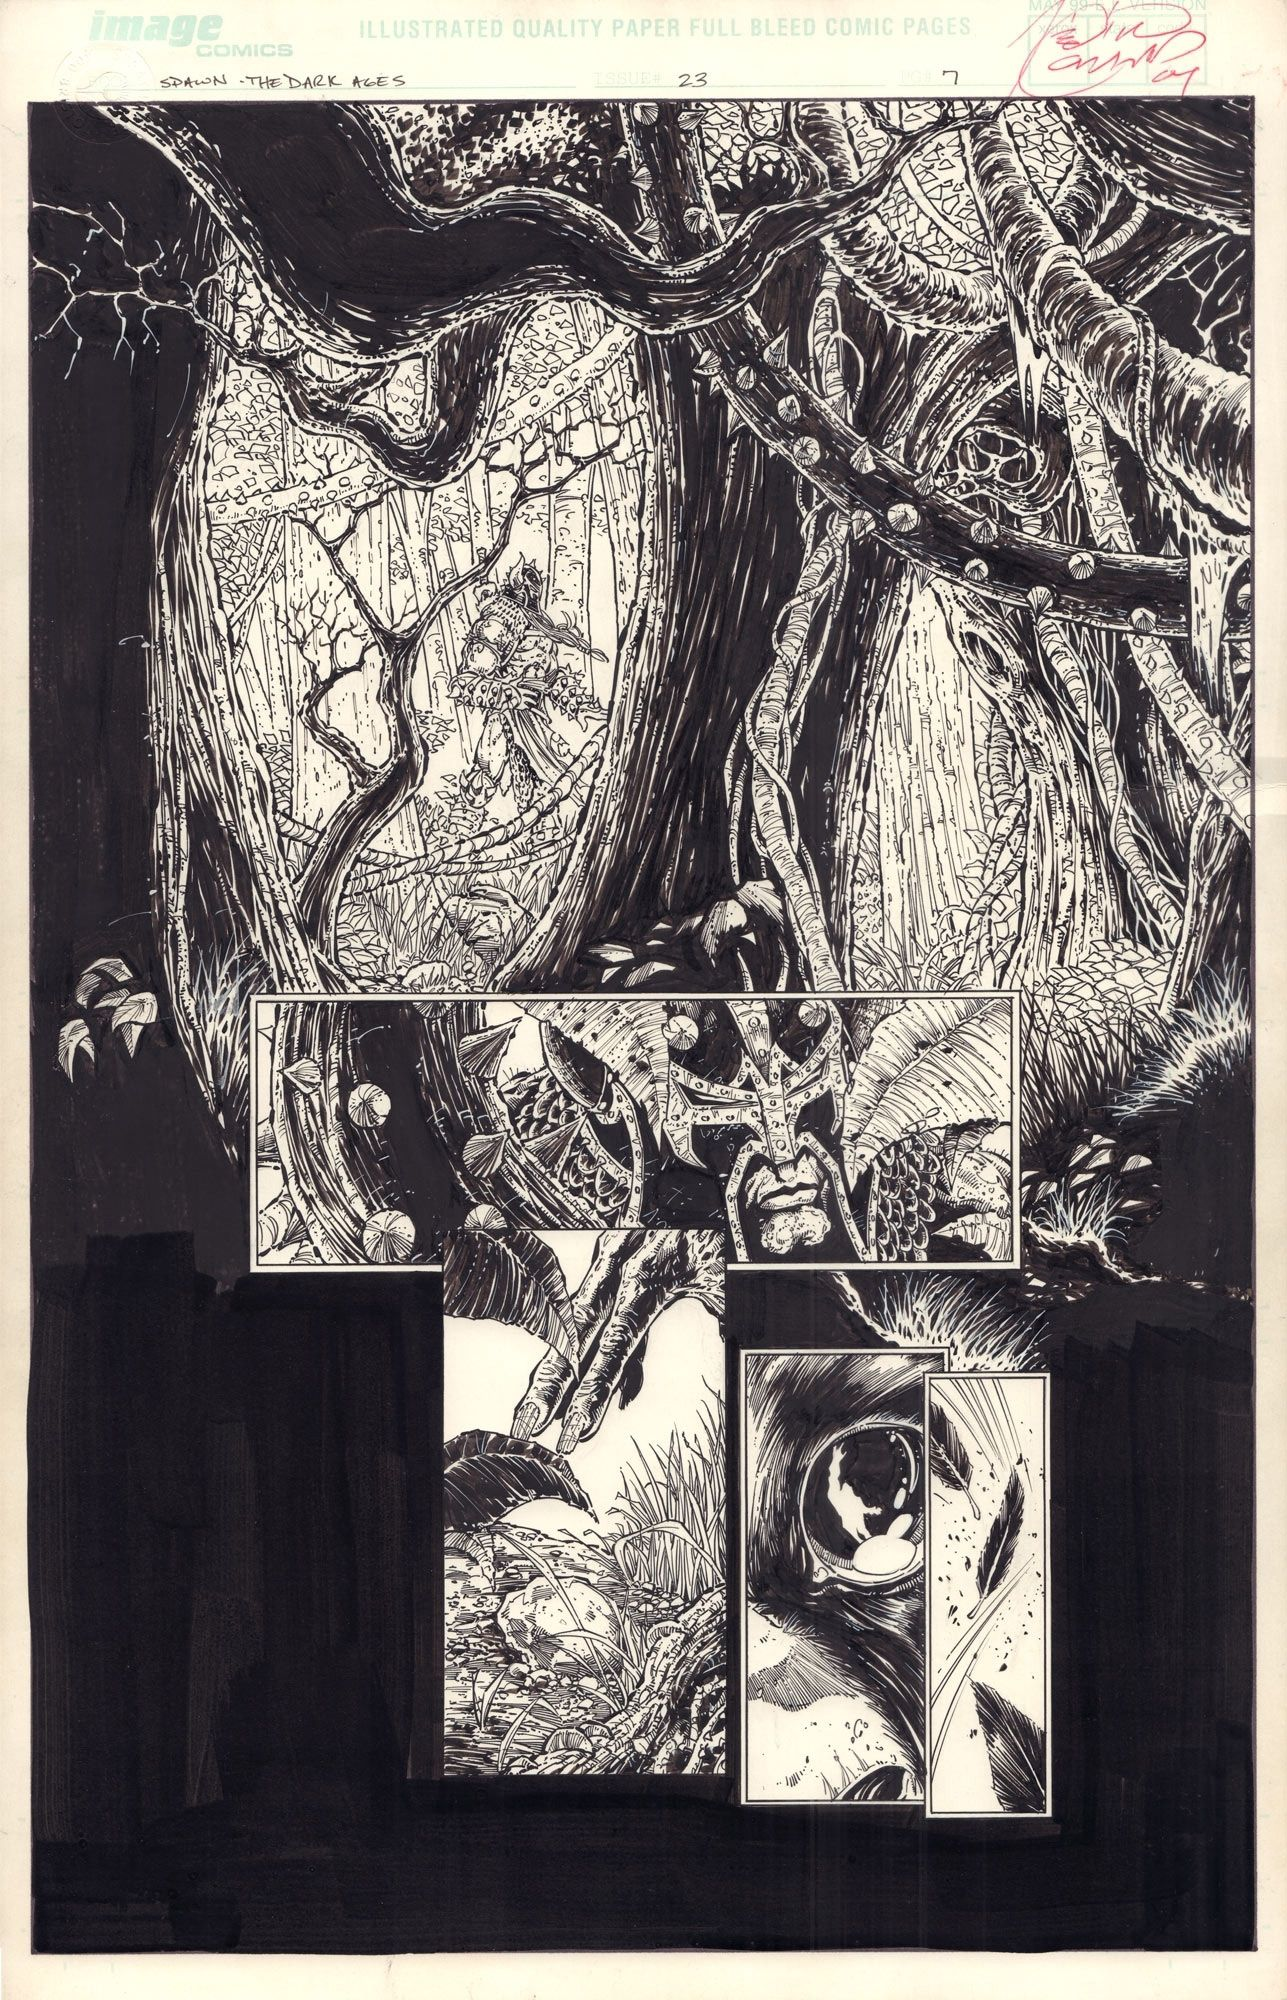 Spawn: The Dark Ages #23 / 7